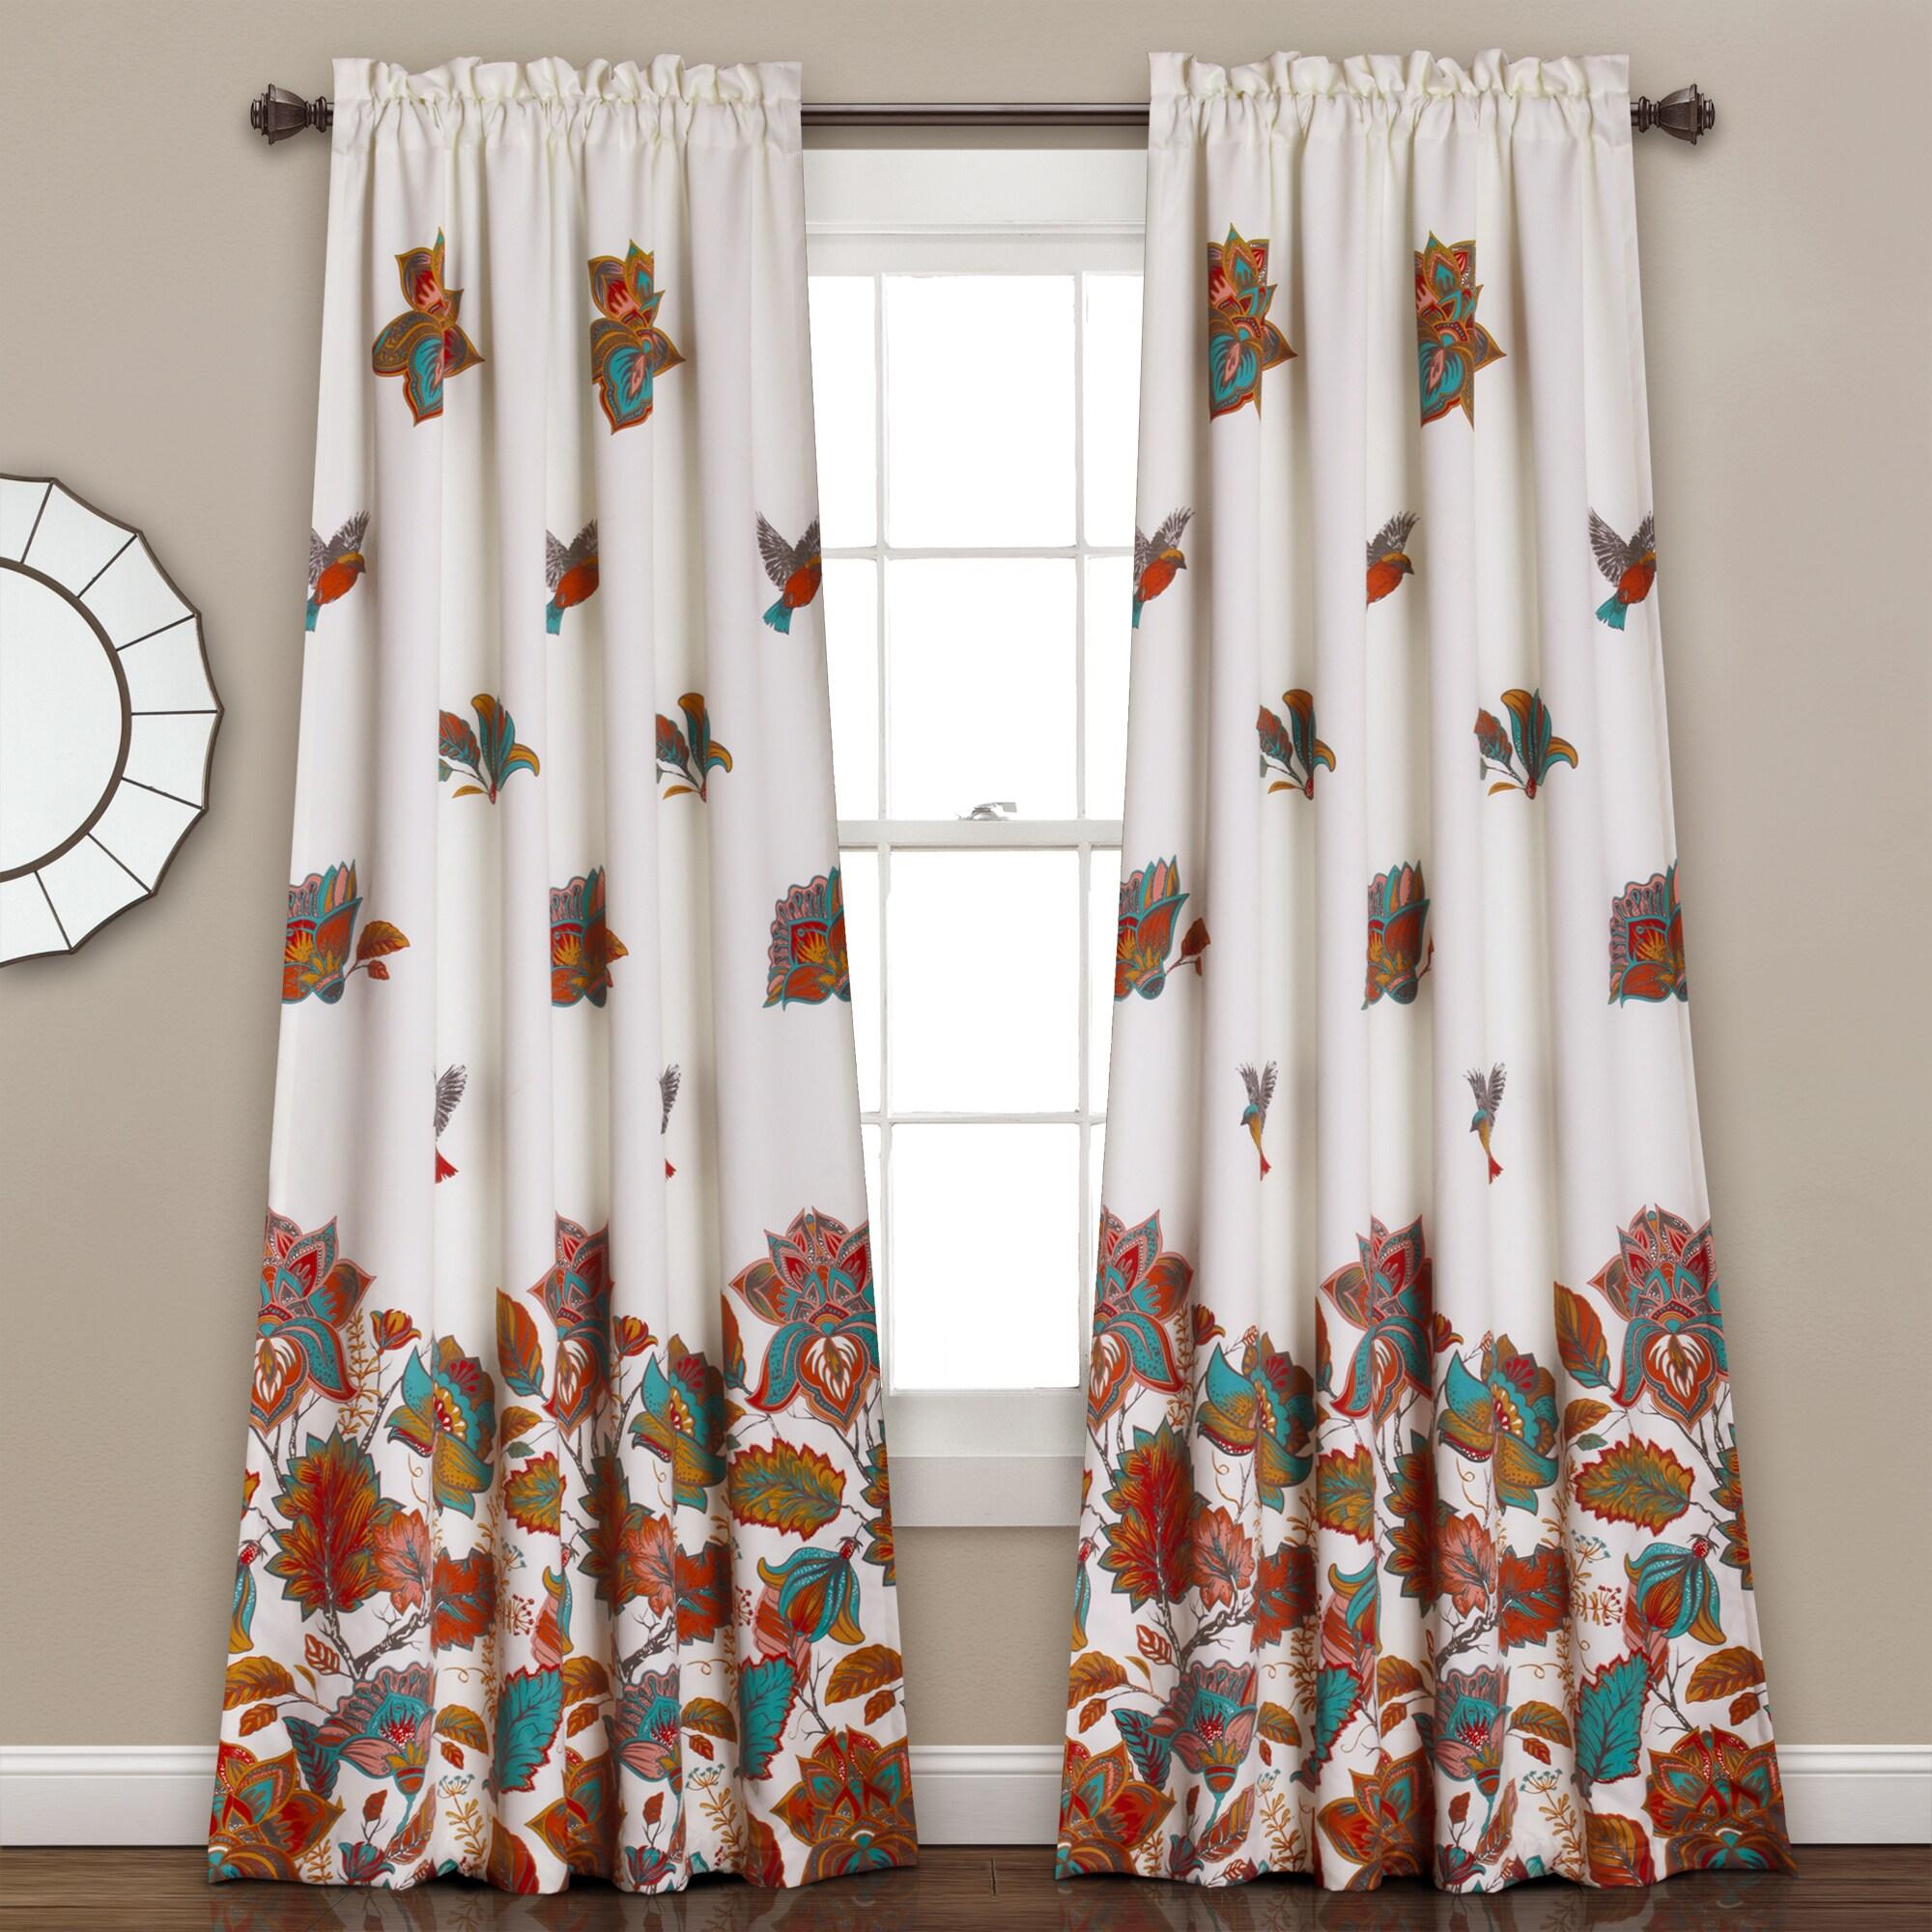 Lush Decor Bird and Flower Room Darkening Window Curtain ...